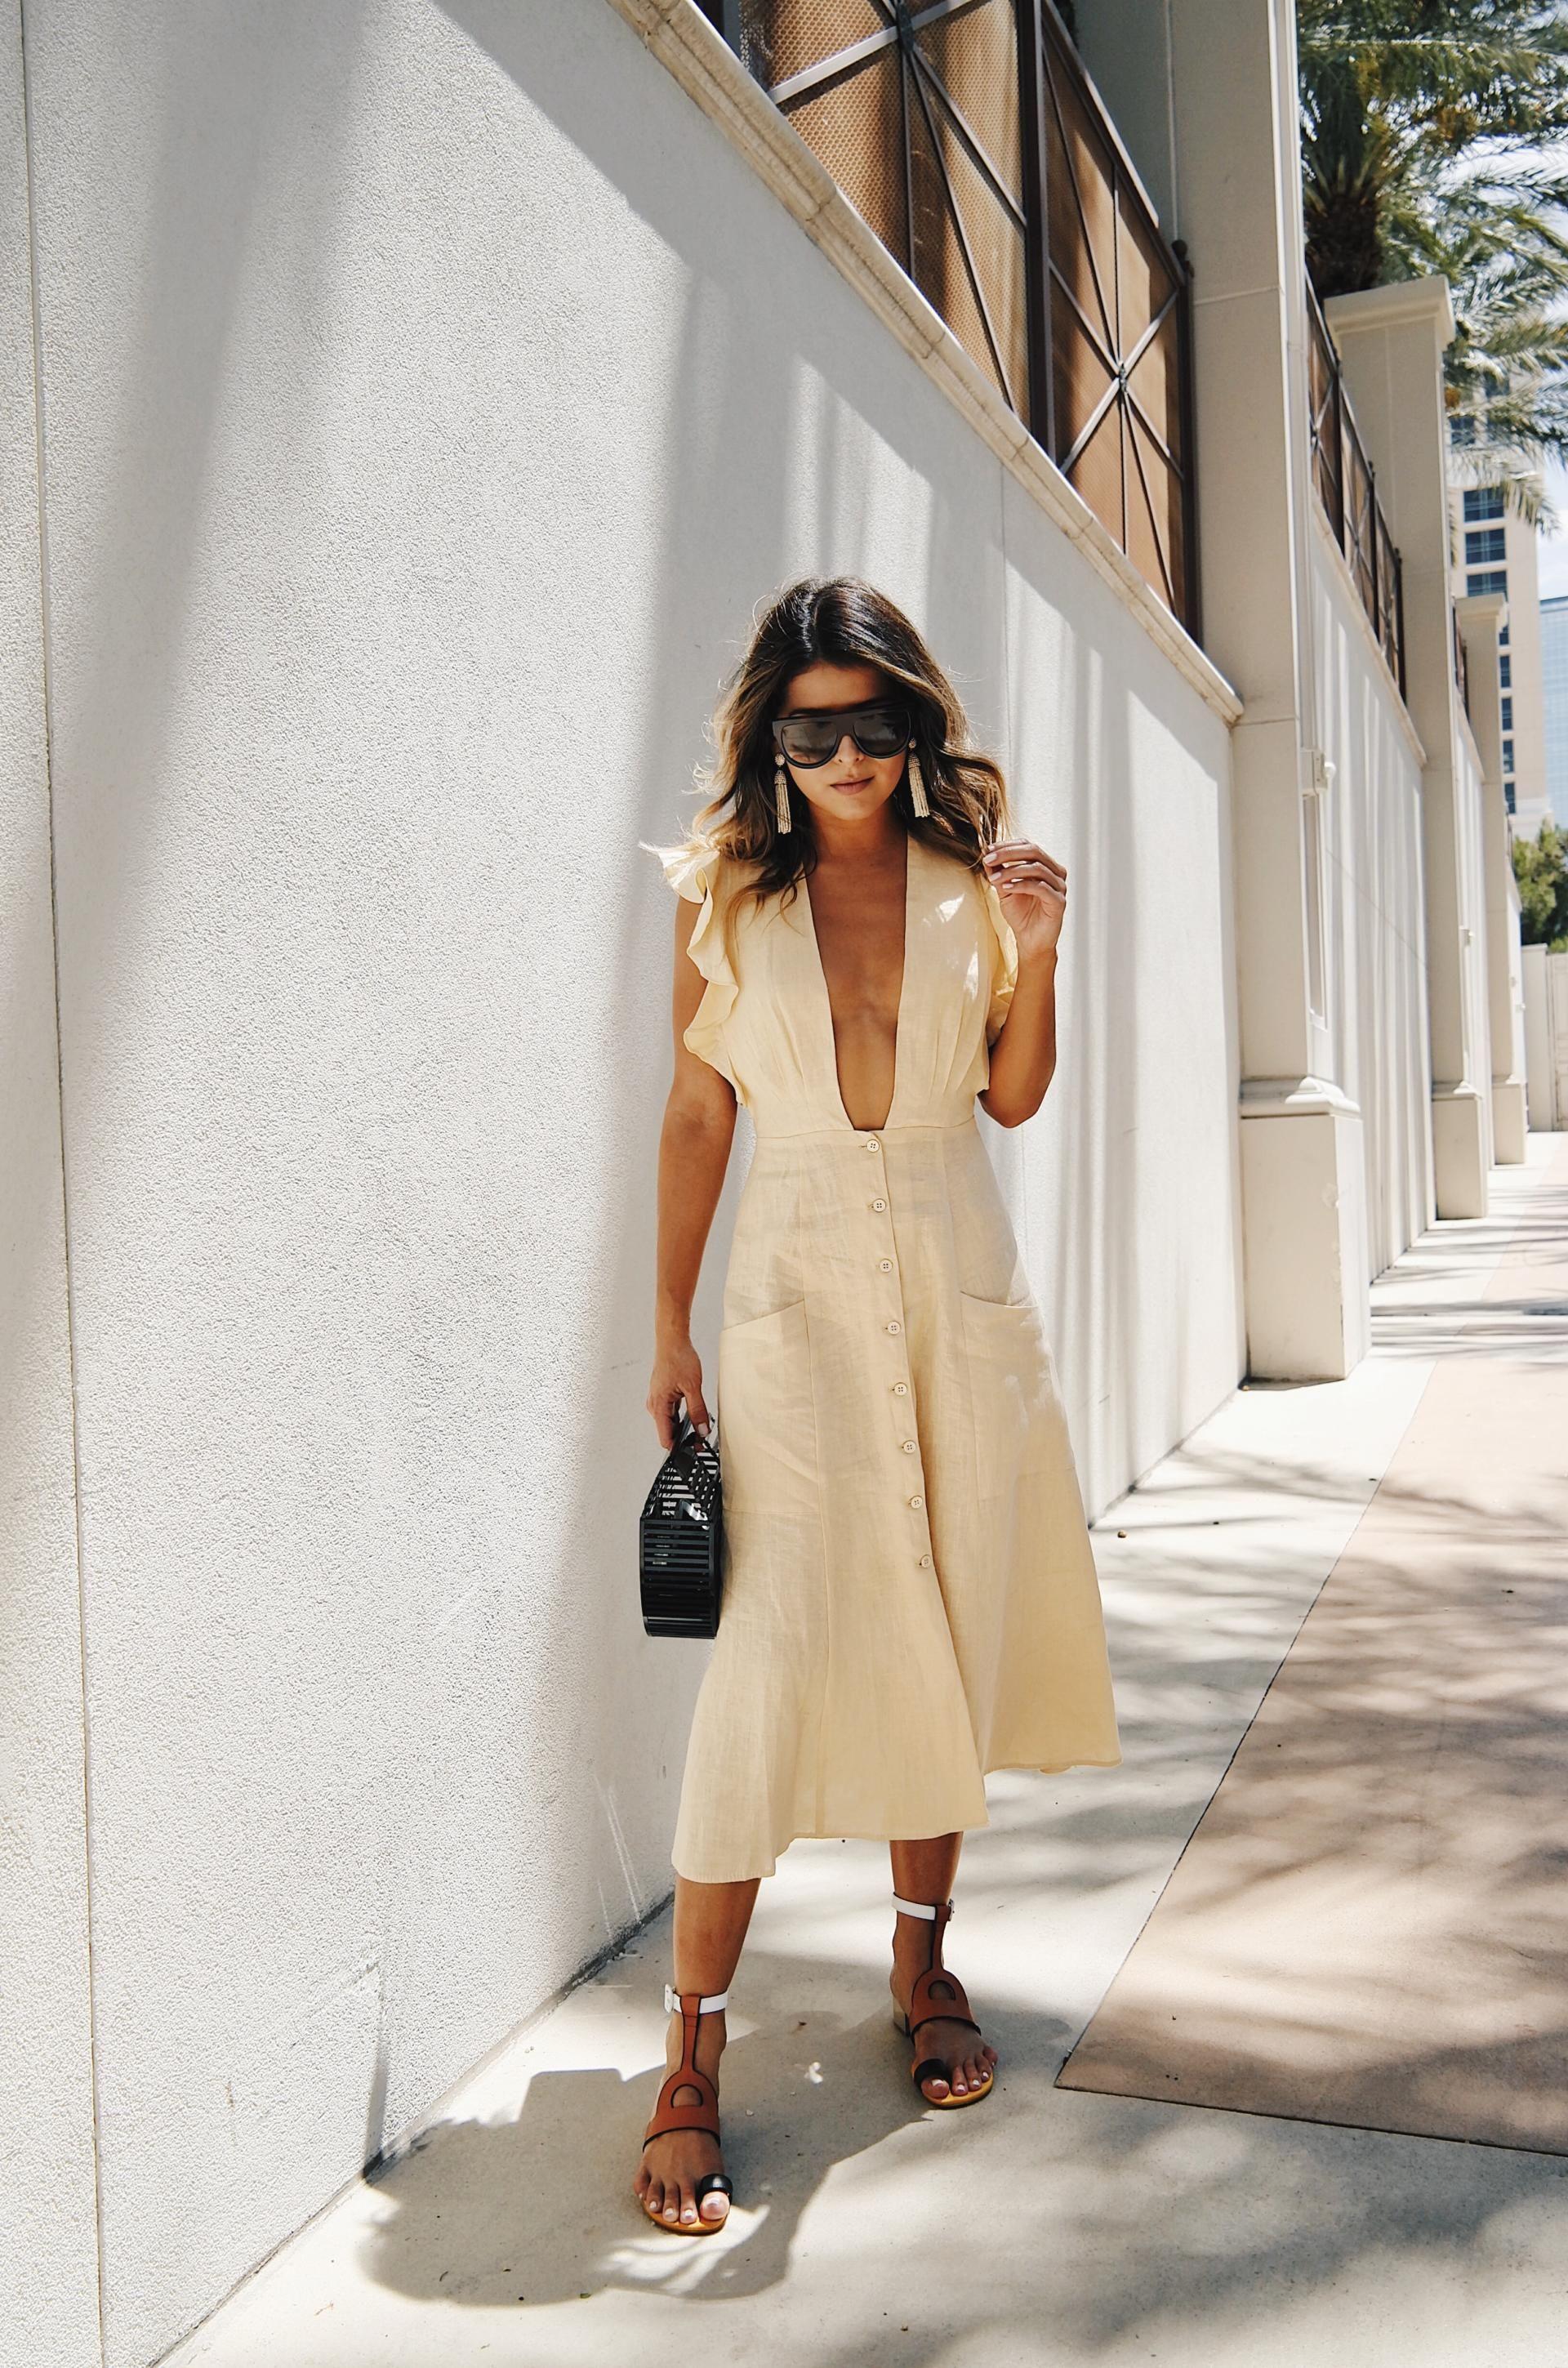 5 Ways To Look Stylish In Las Vegas The Girl From Panama Vegas Outfit Style Las Vegas Outfit [ 2899 x 1920 Pixel ]